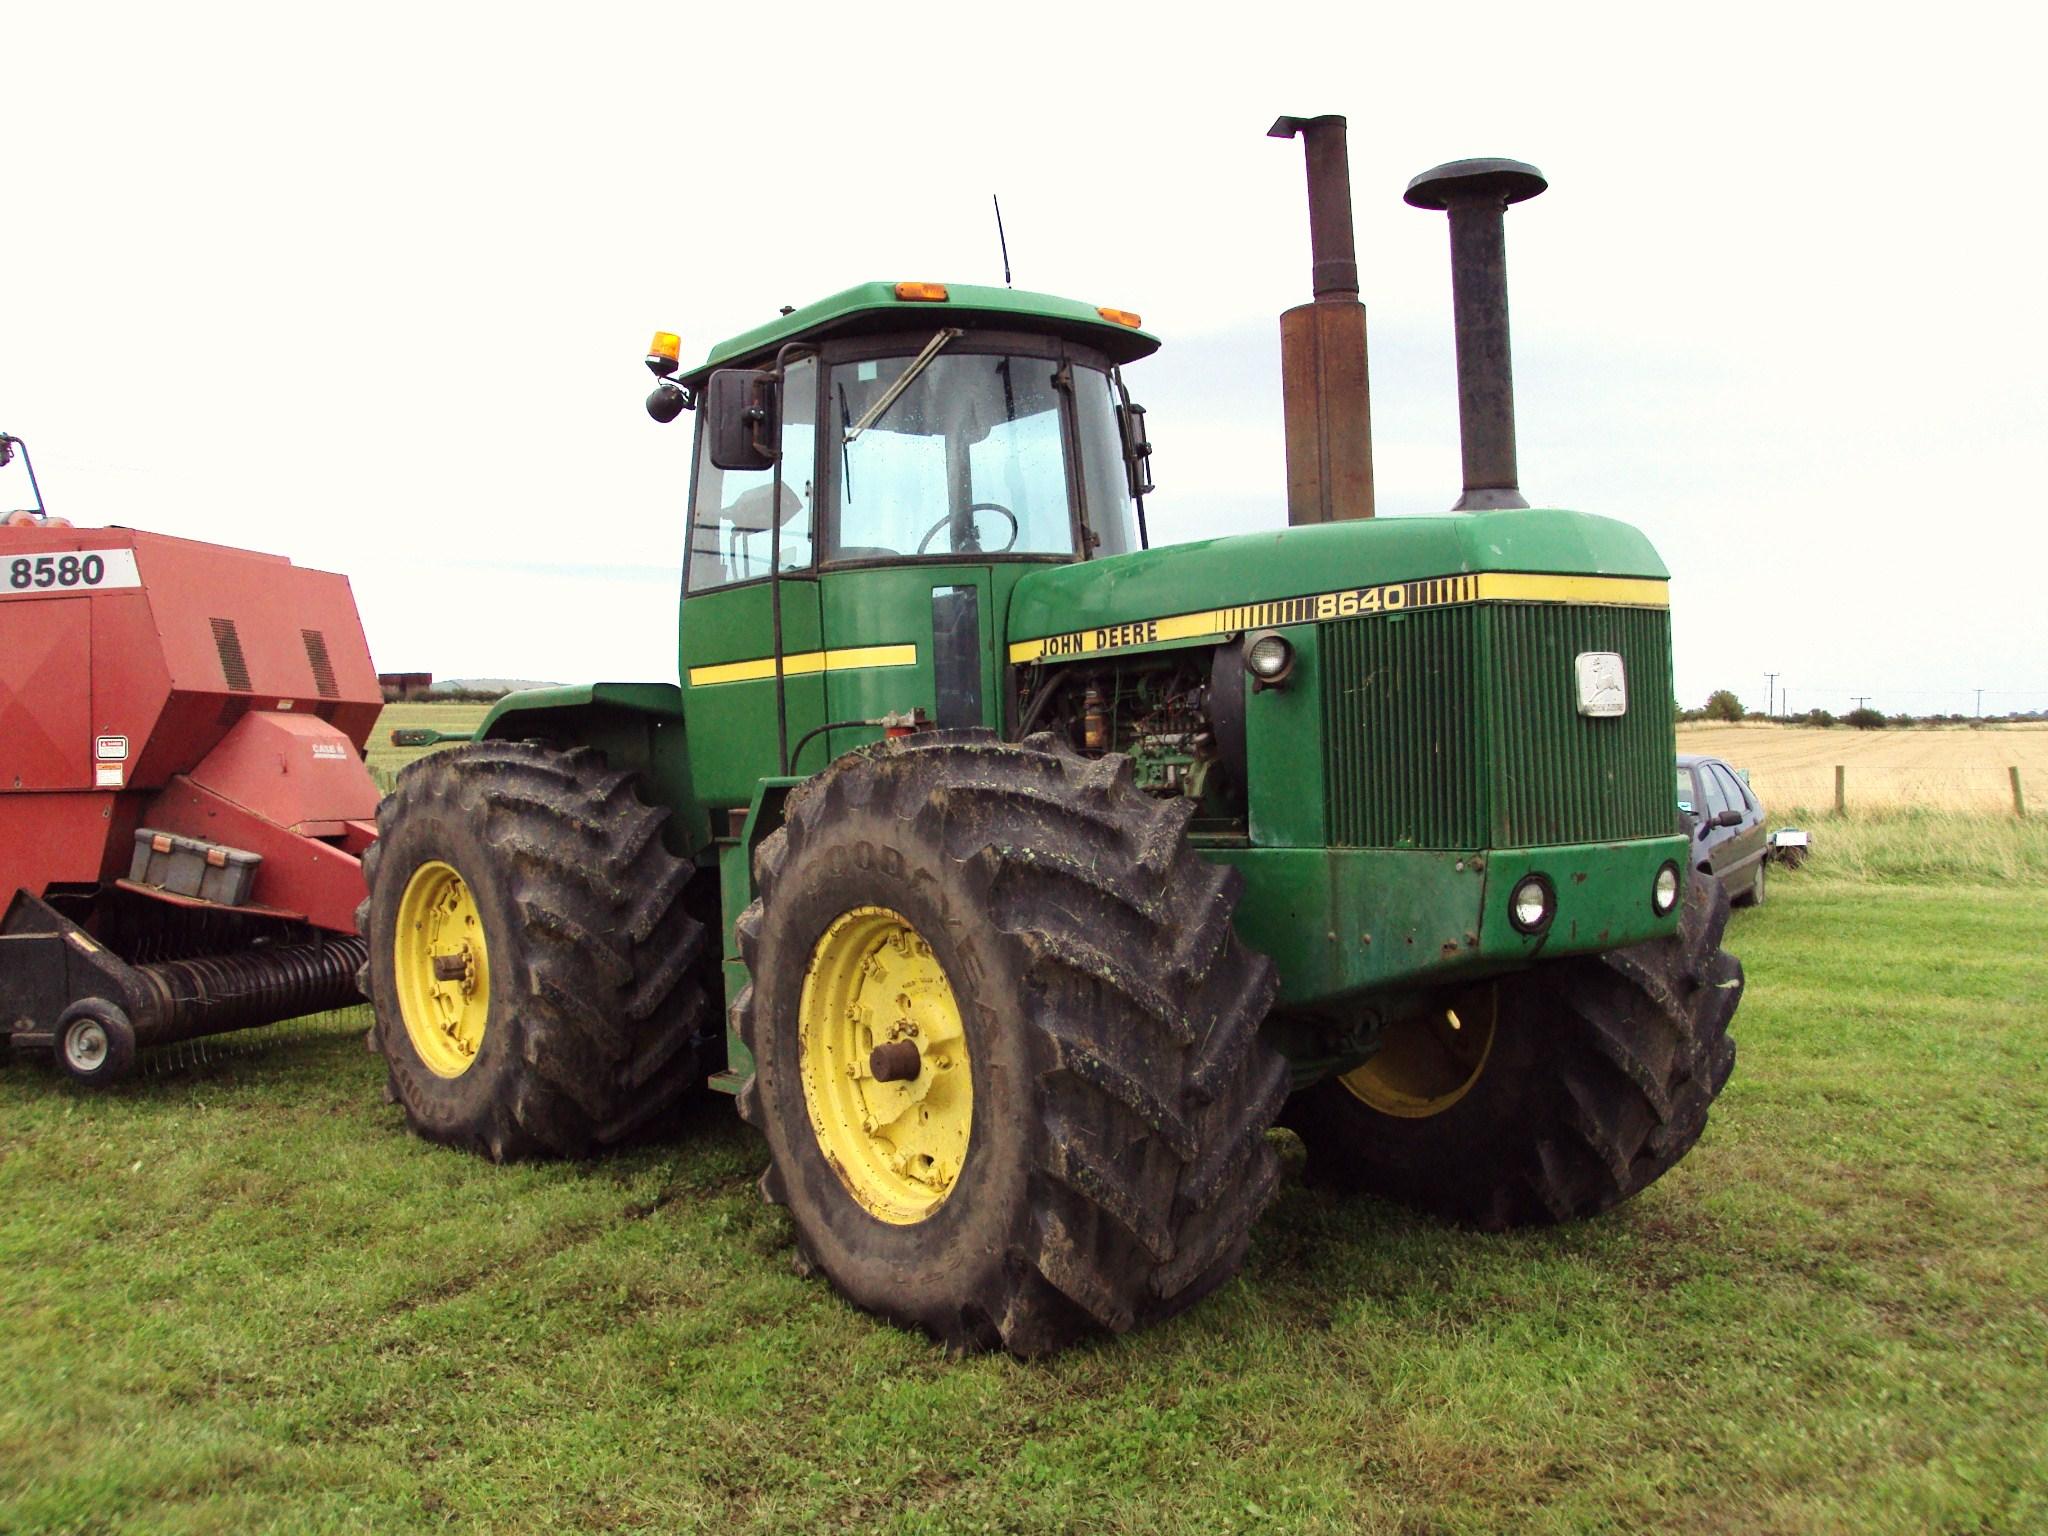 John Deere 8640 Wiring Diagram Manual Of 200 Info List Tractors Tractor Construction Plant Wiki Rh Wikia Com